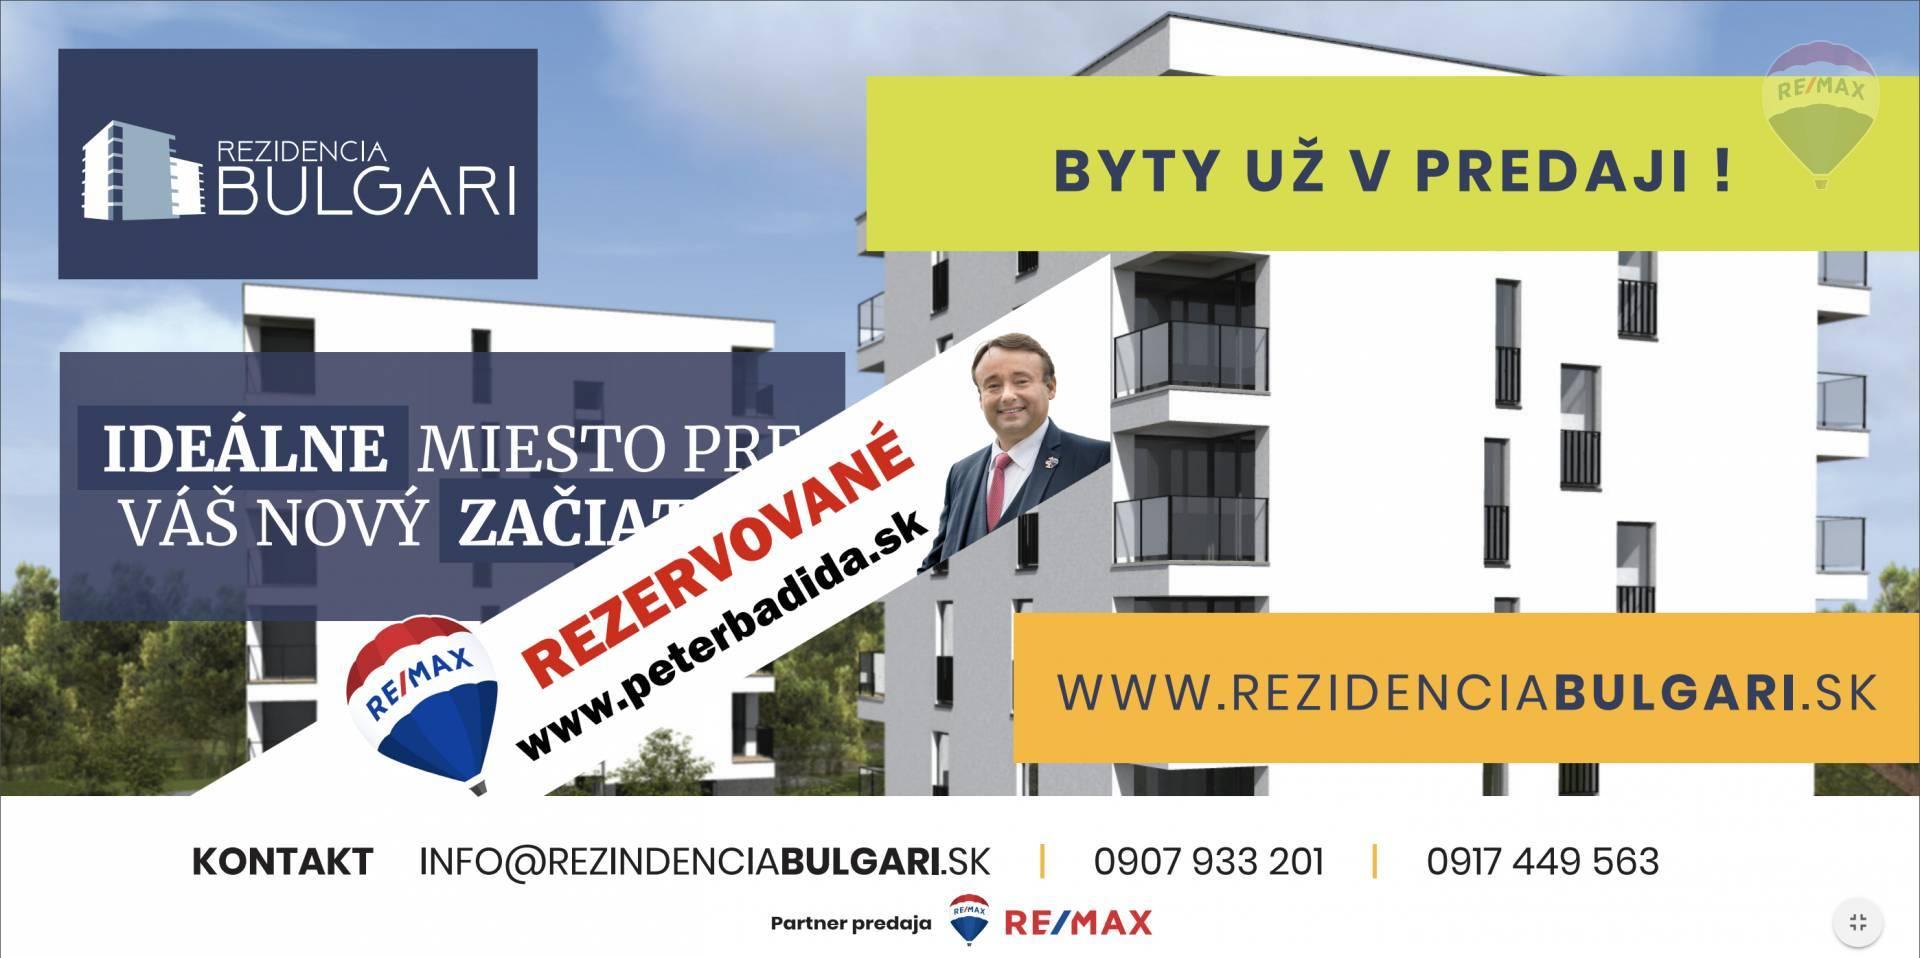 *** R E Z E R V O V A N É *** Na predaj 2 izbový byt Bulharská ulica v Prešove